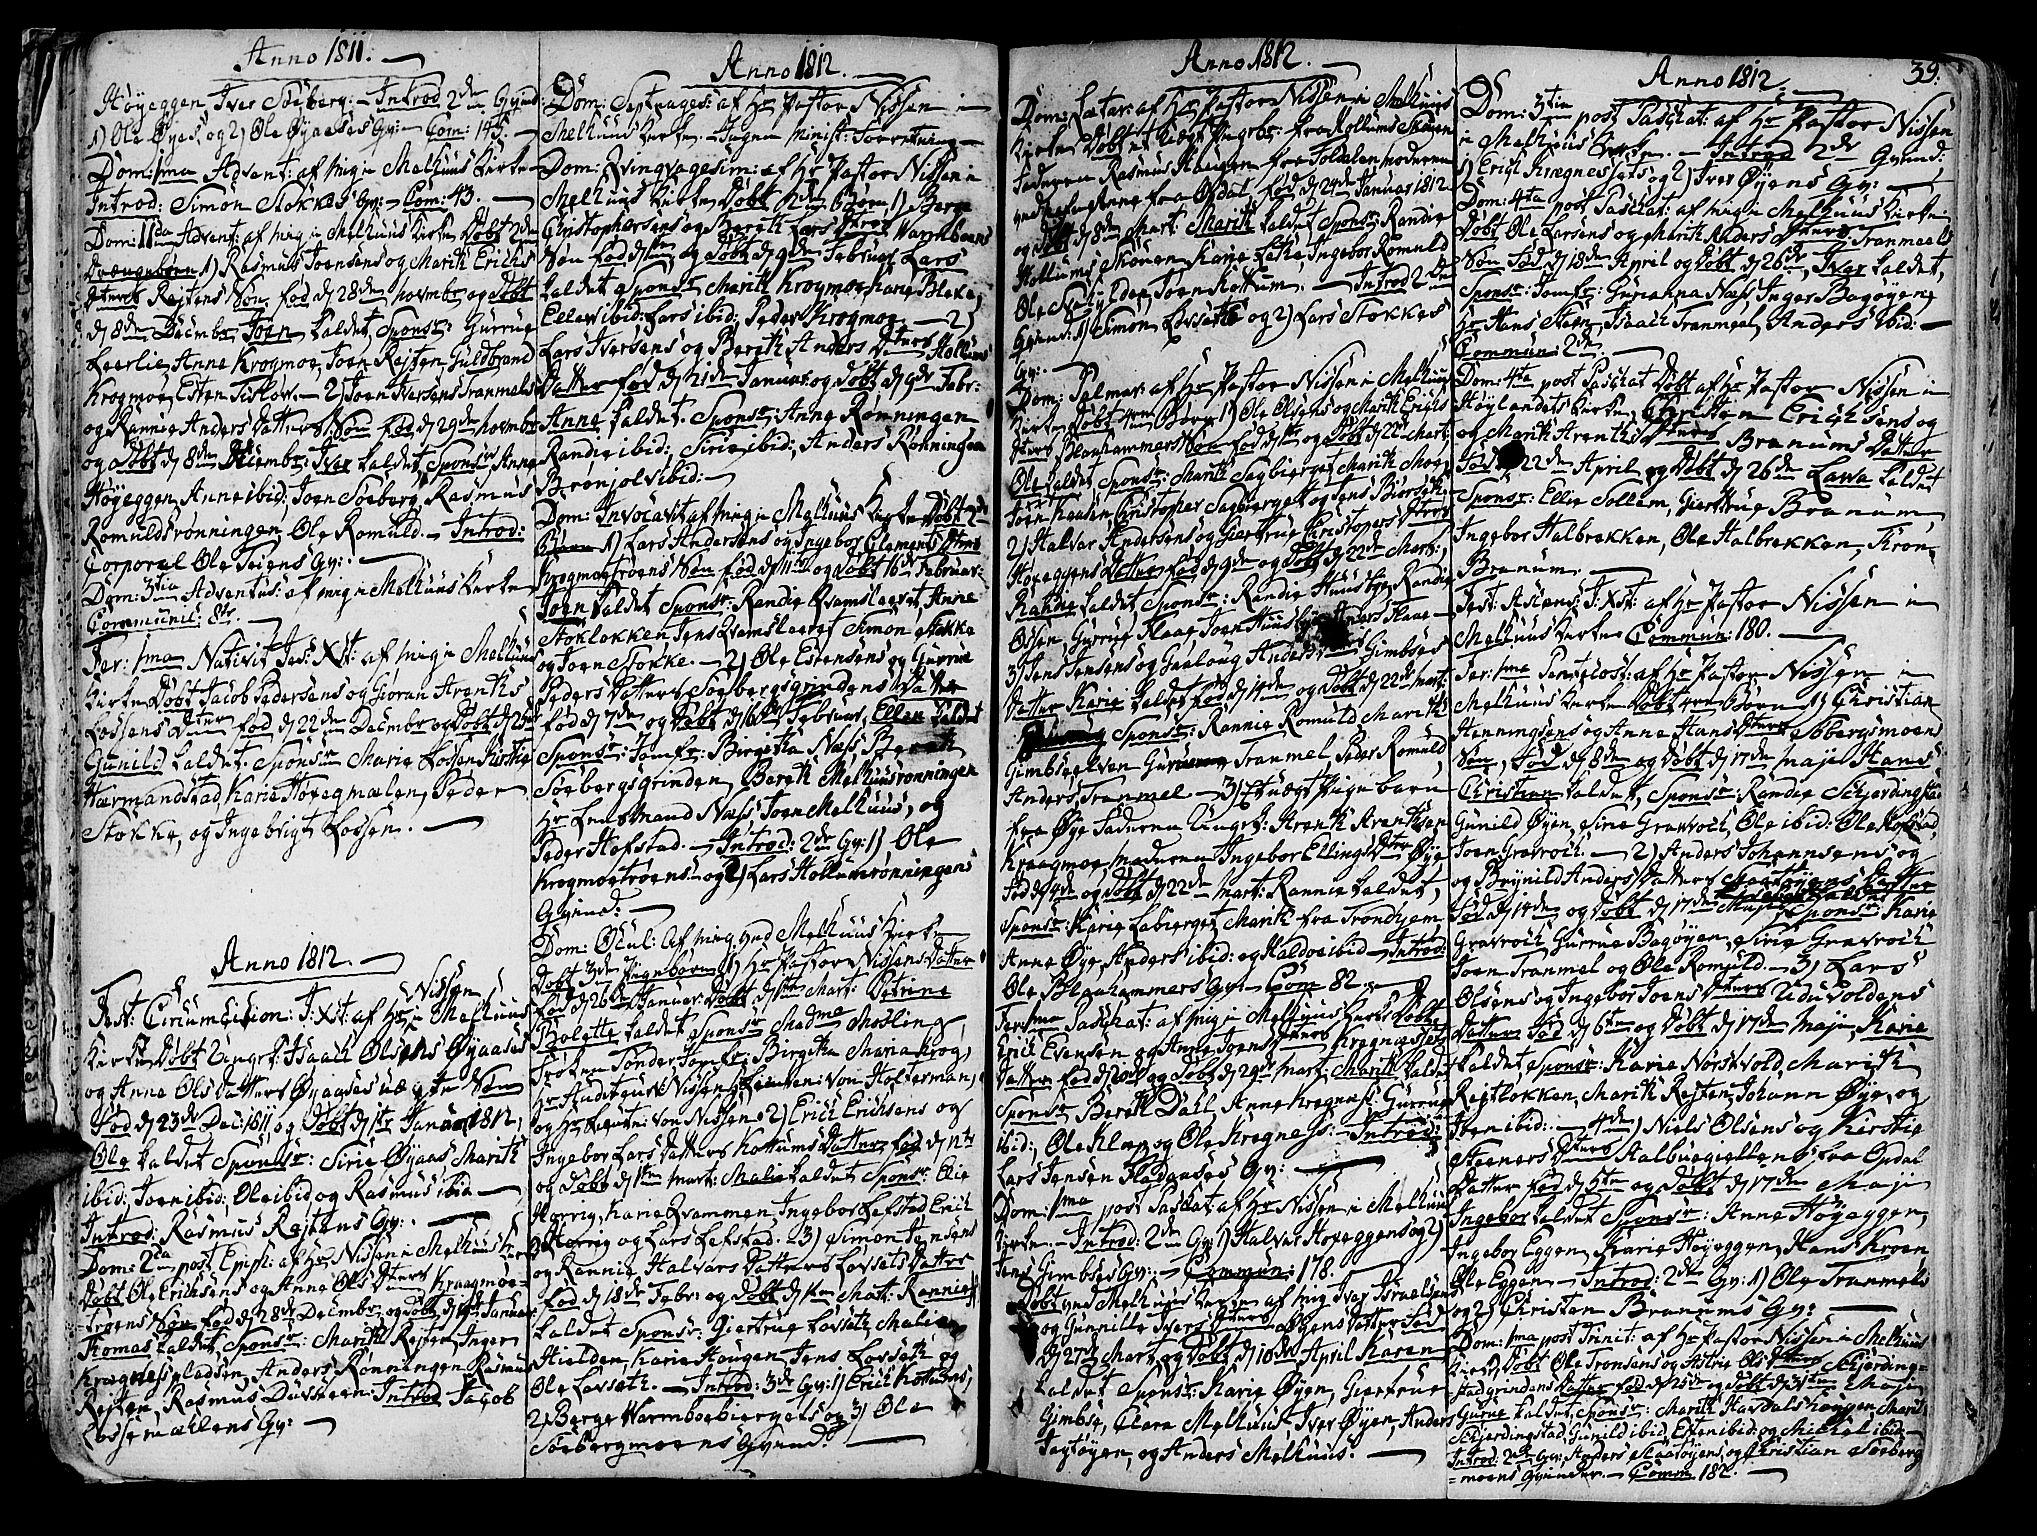 SAT, Ministerialprotokoller, klokkerbøker og fødselsregistre - Sør-Trøndelag, 691/L1061: Parish register (official) no. 691A02 /1, 1768-1815, p. 39